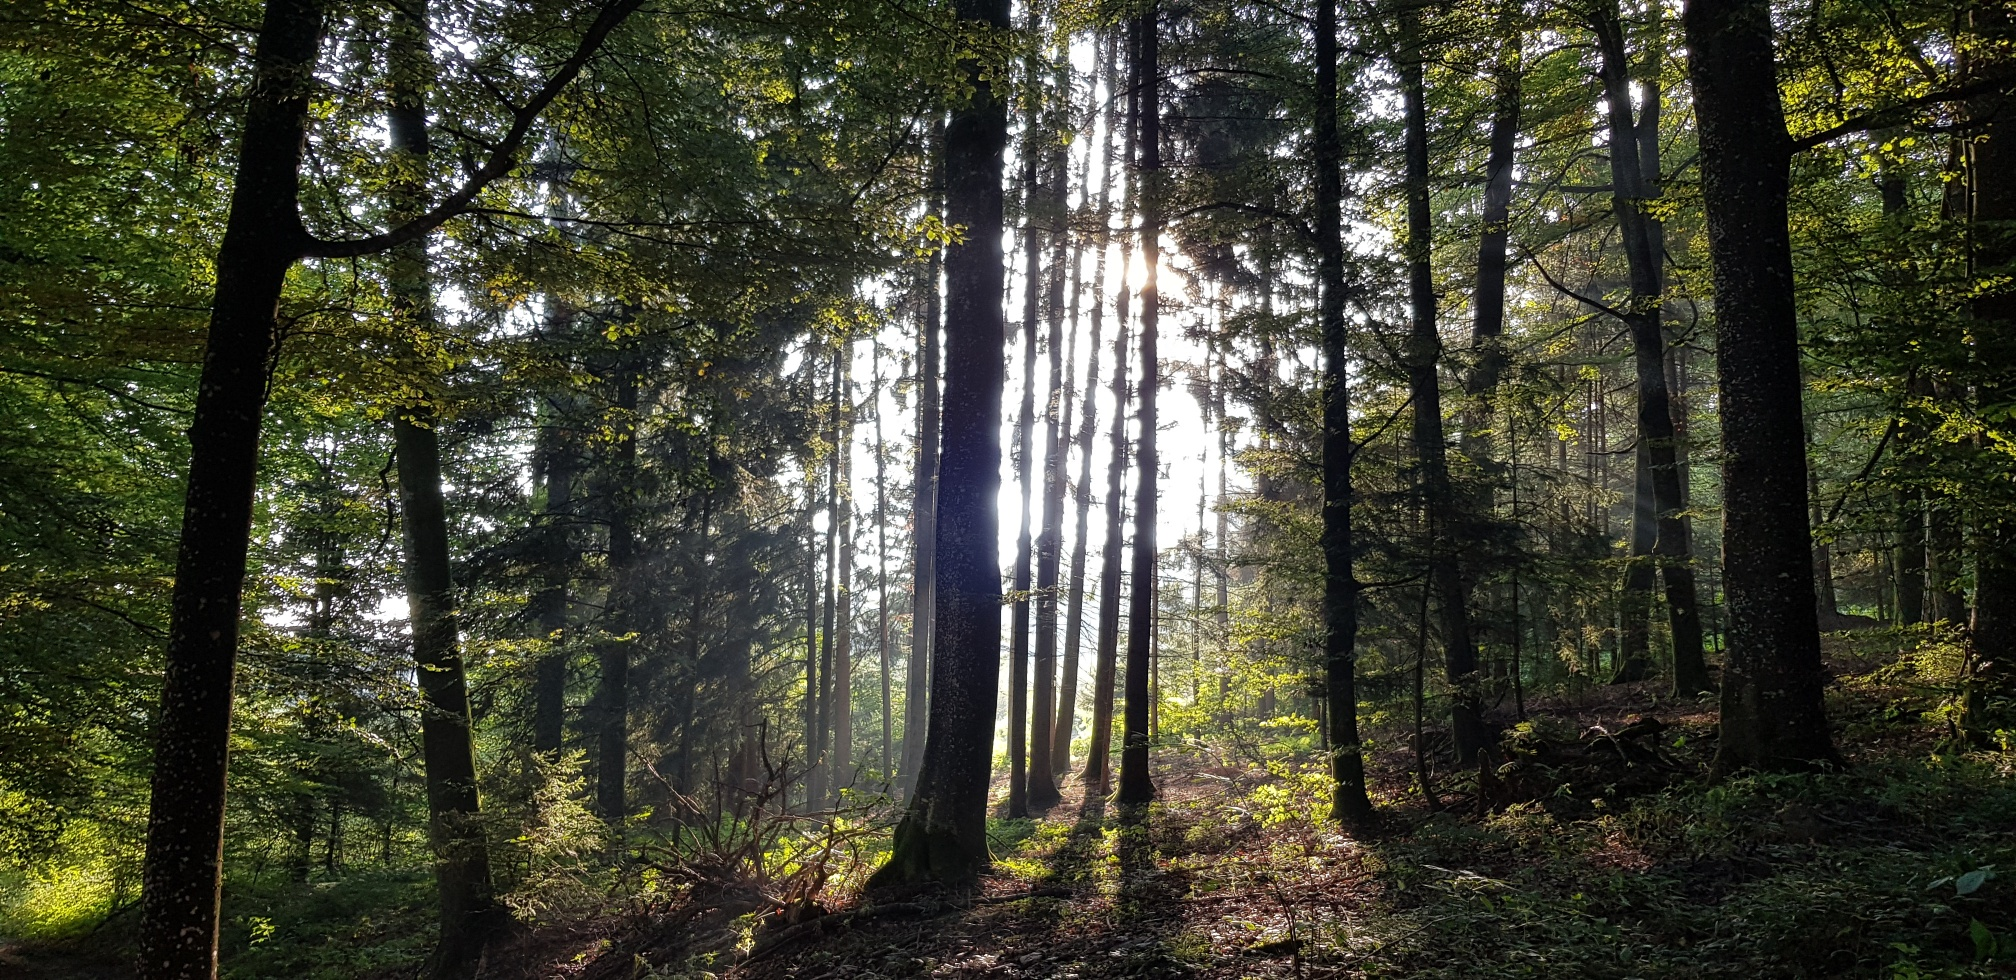 Fremde Wälder